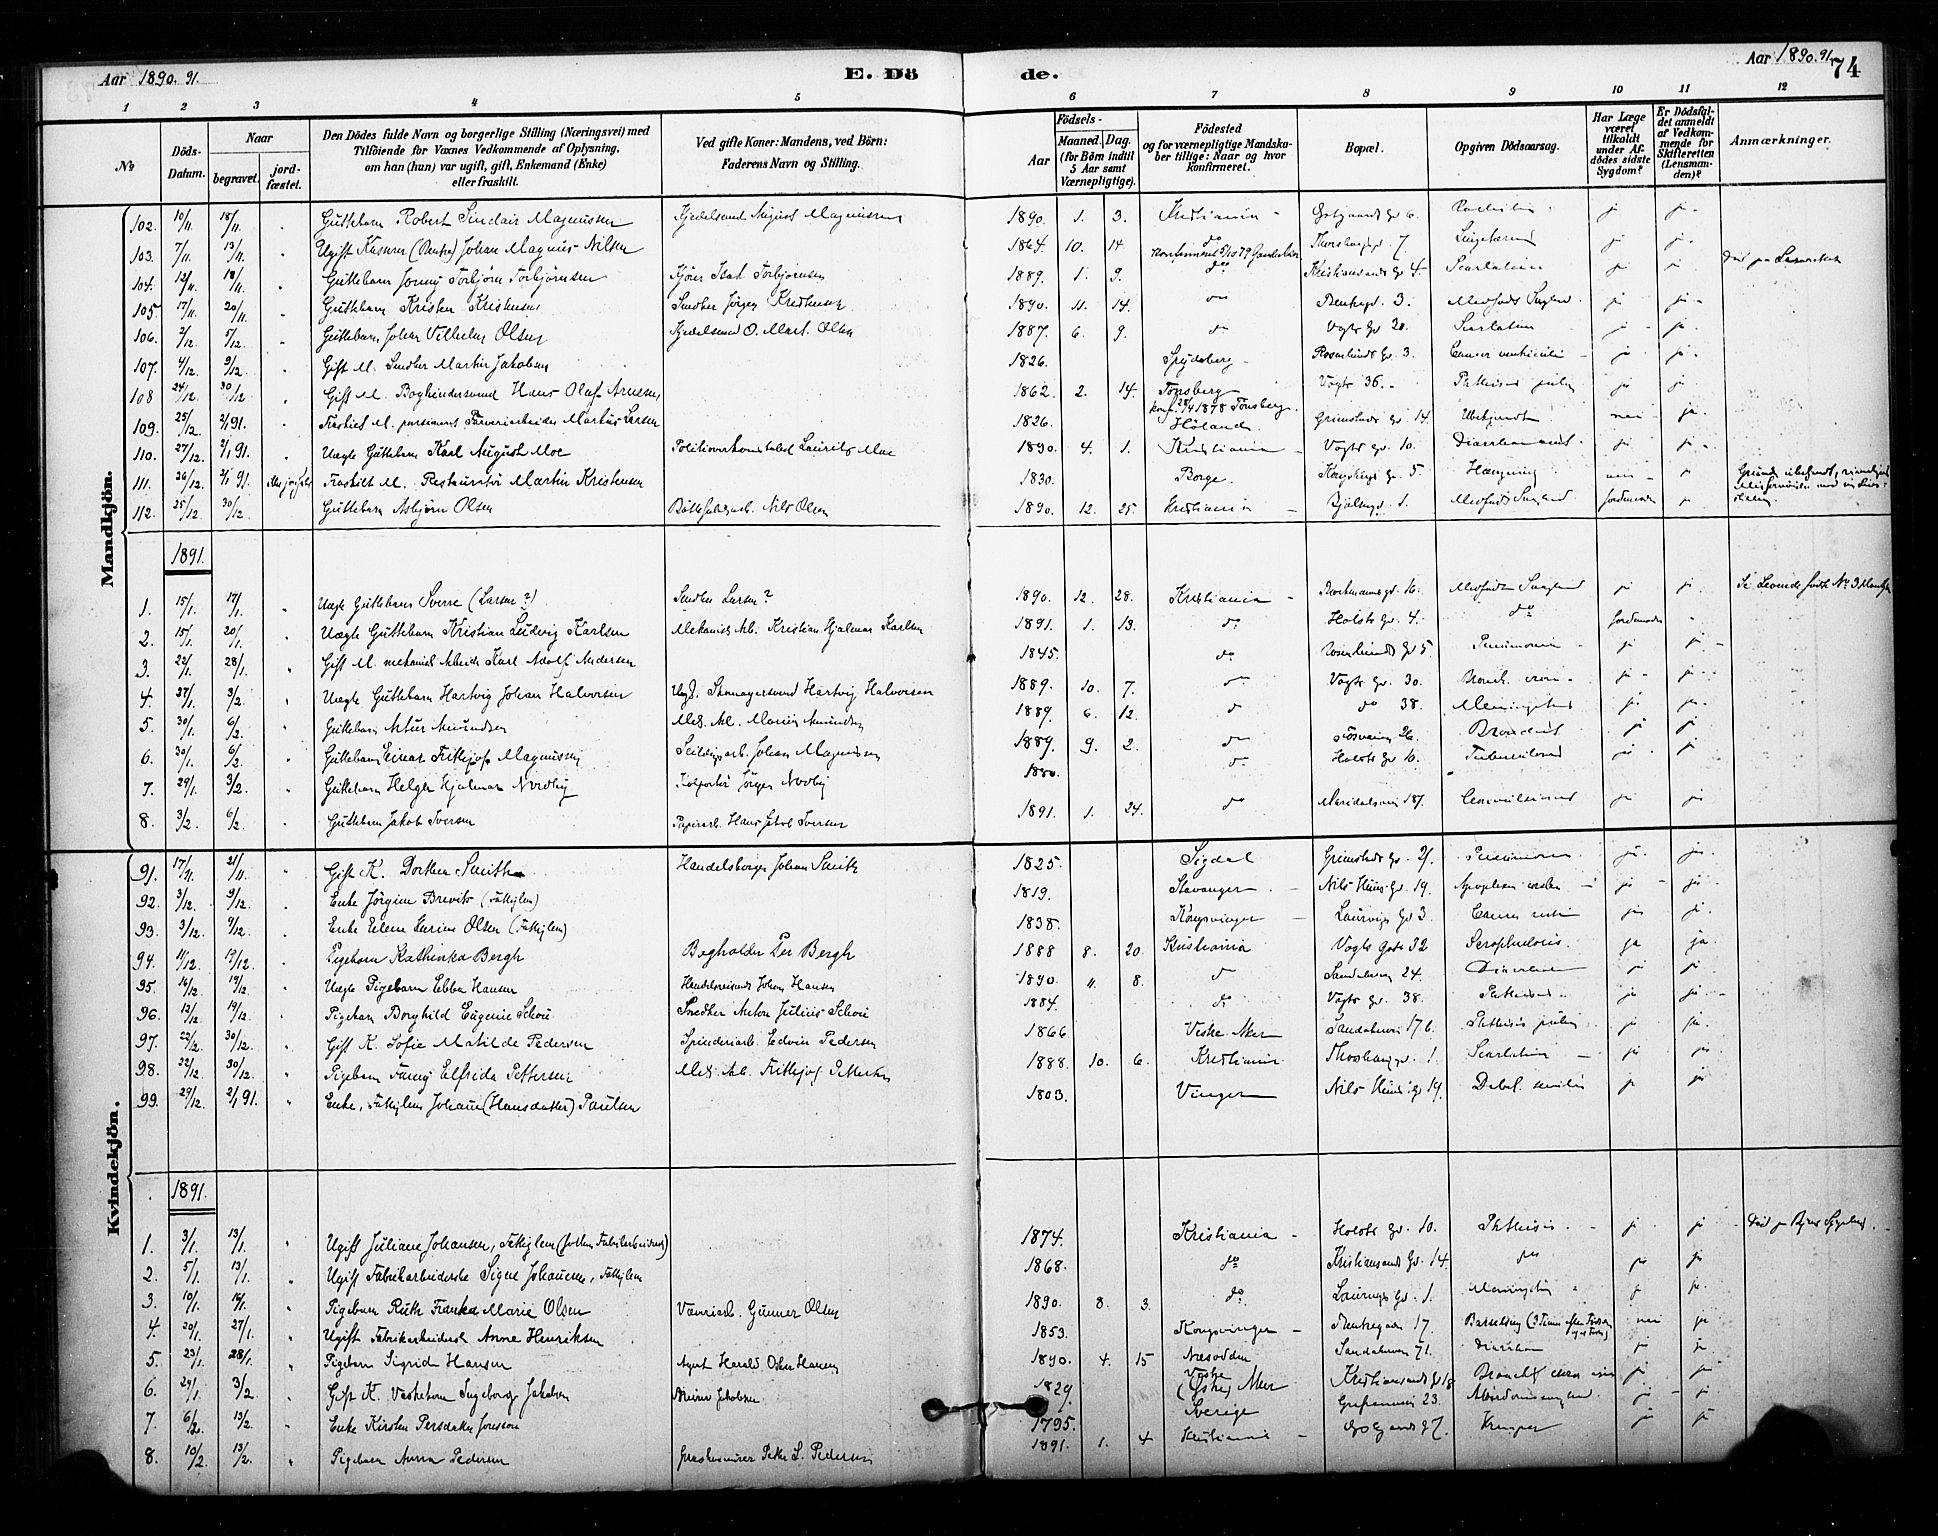 SAO, Sagene prestekontor Kirkebøker, F/L0003: Ministerialbok nr. 3, 1880-1922, s. 74